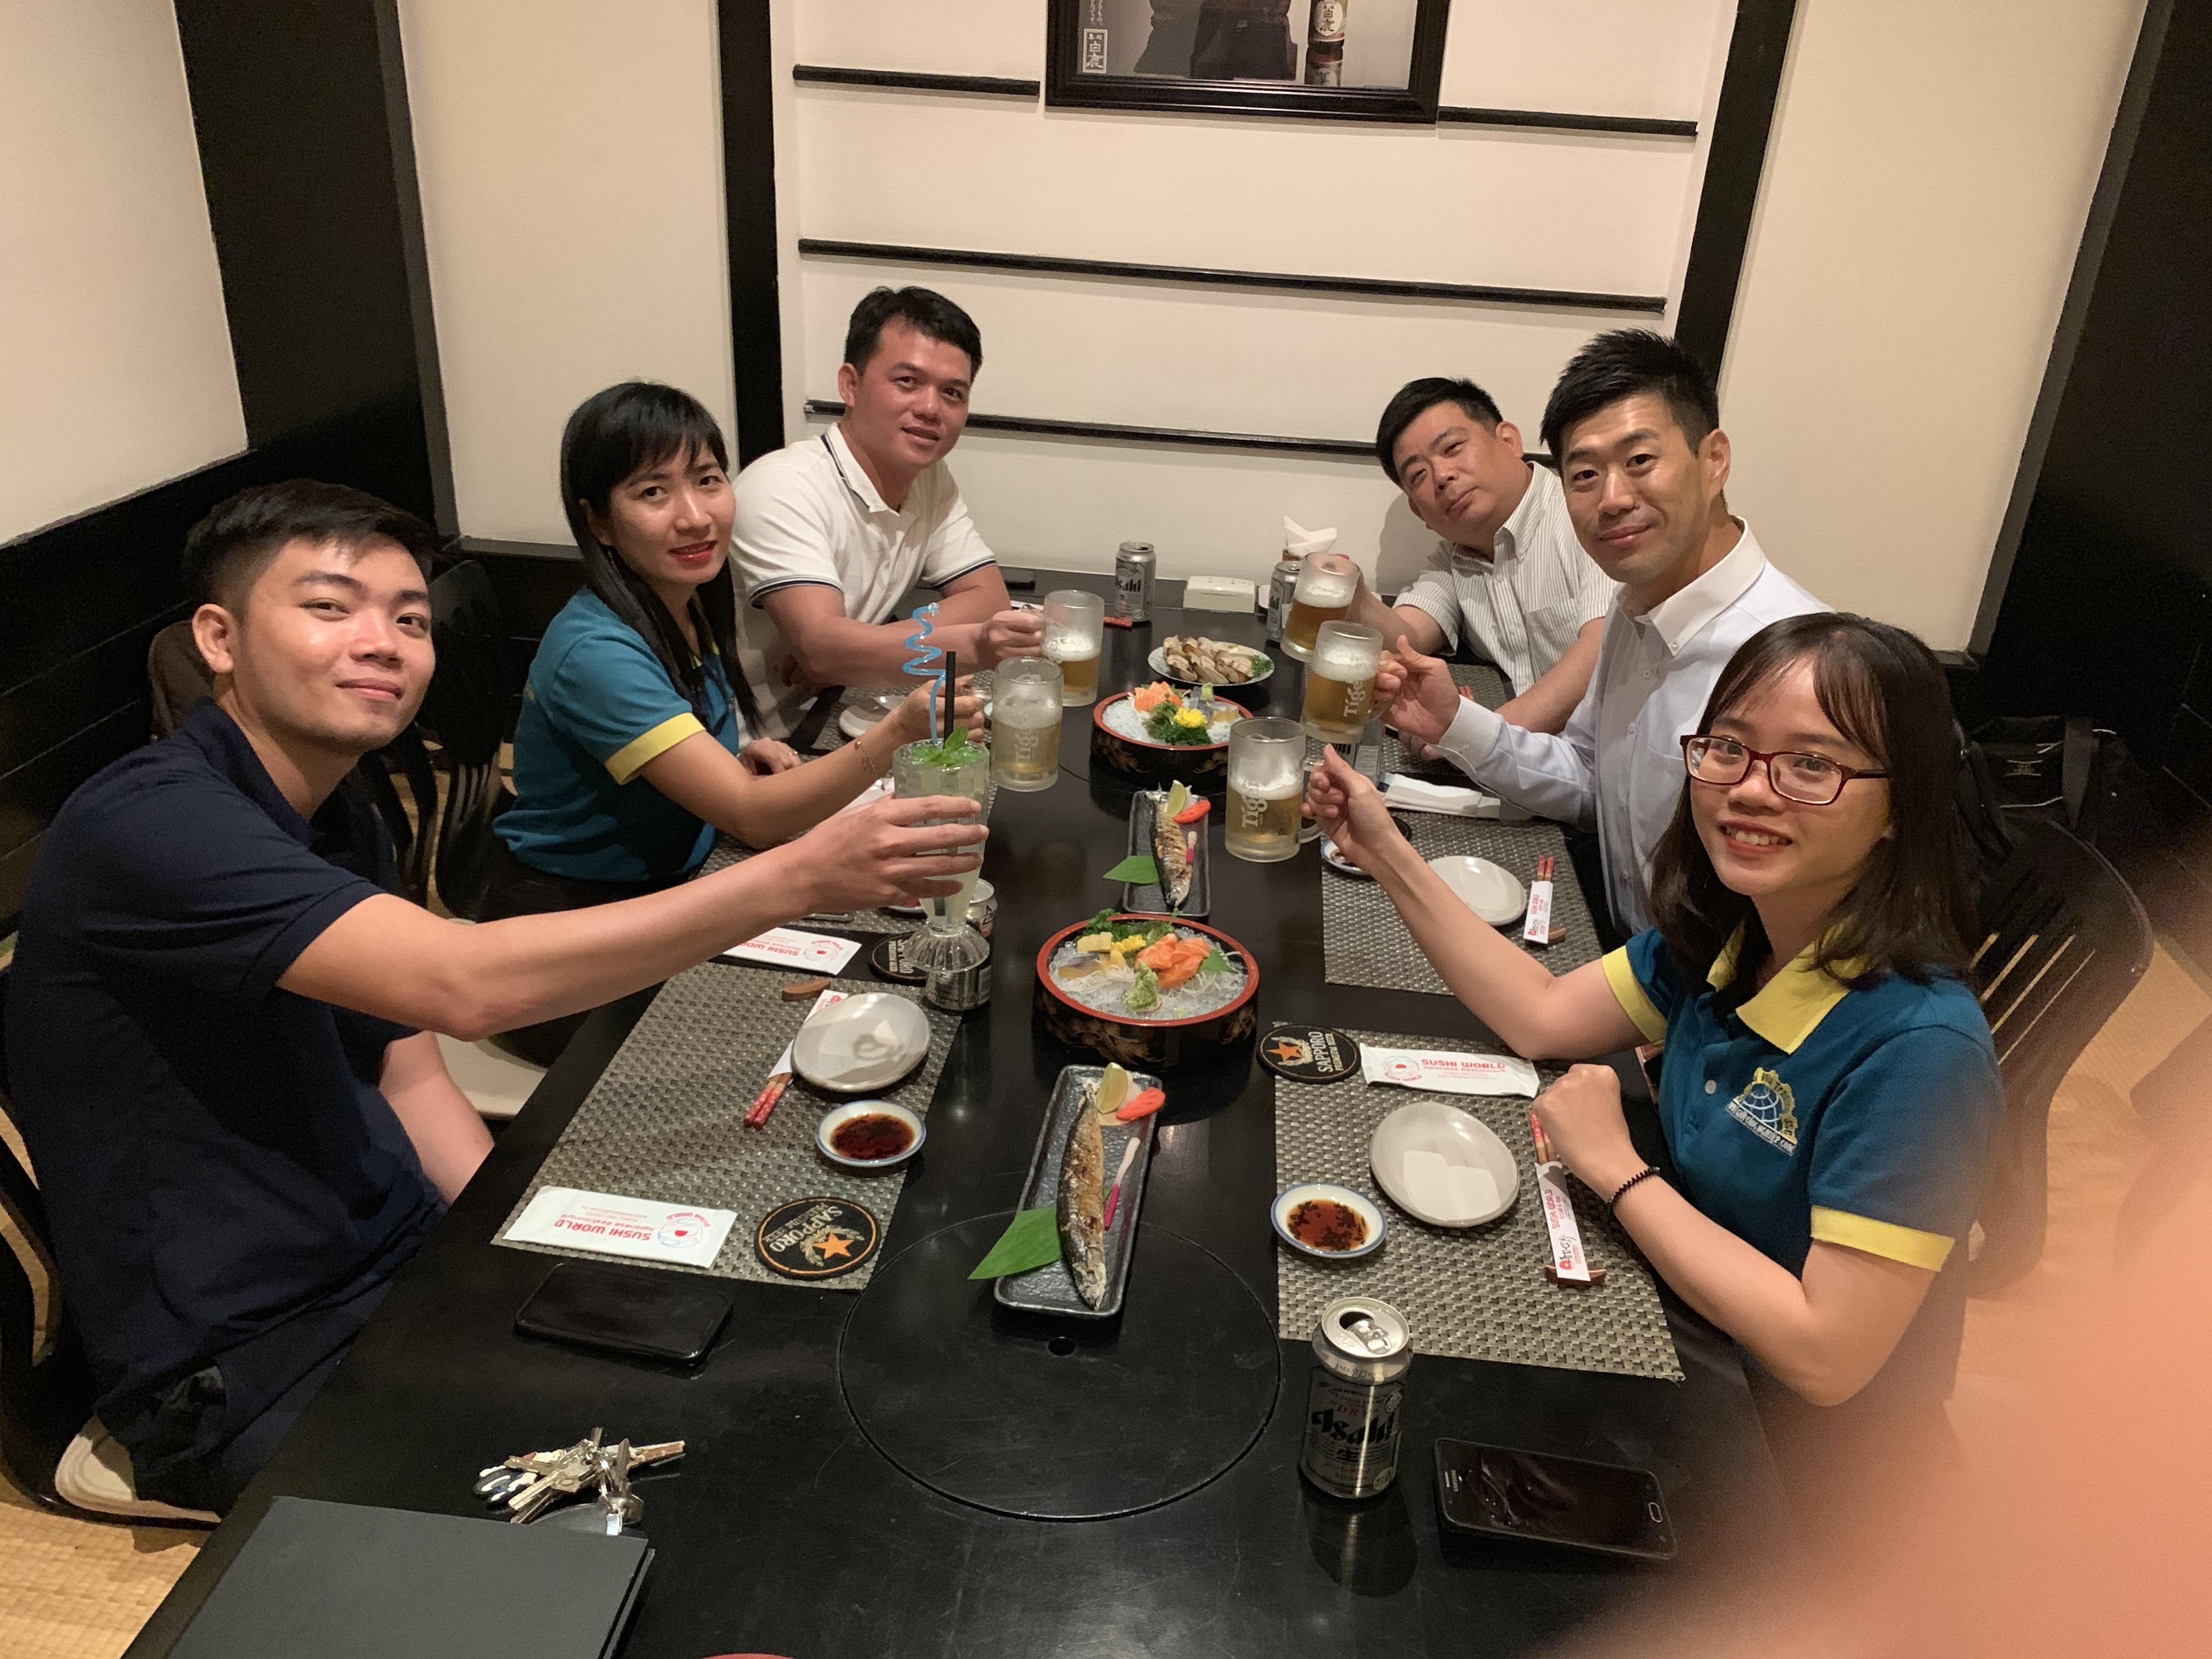 Japanese friends